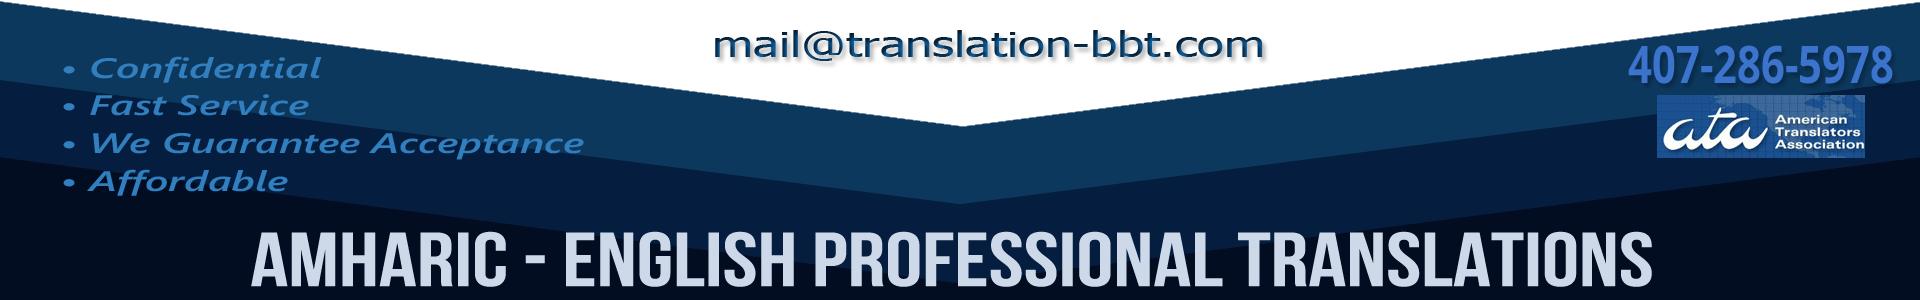 english to amharic translation